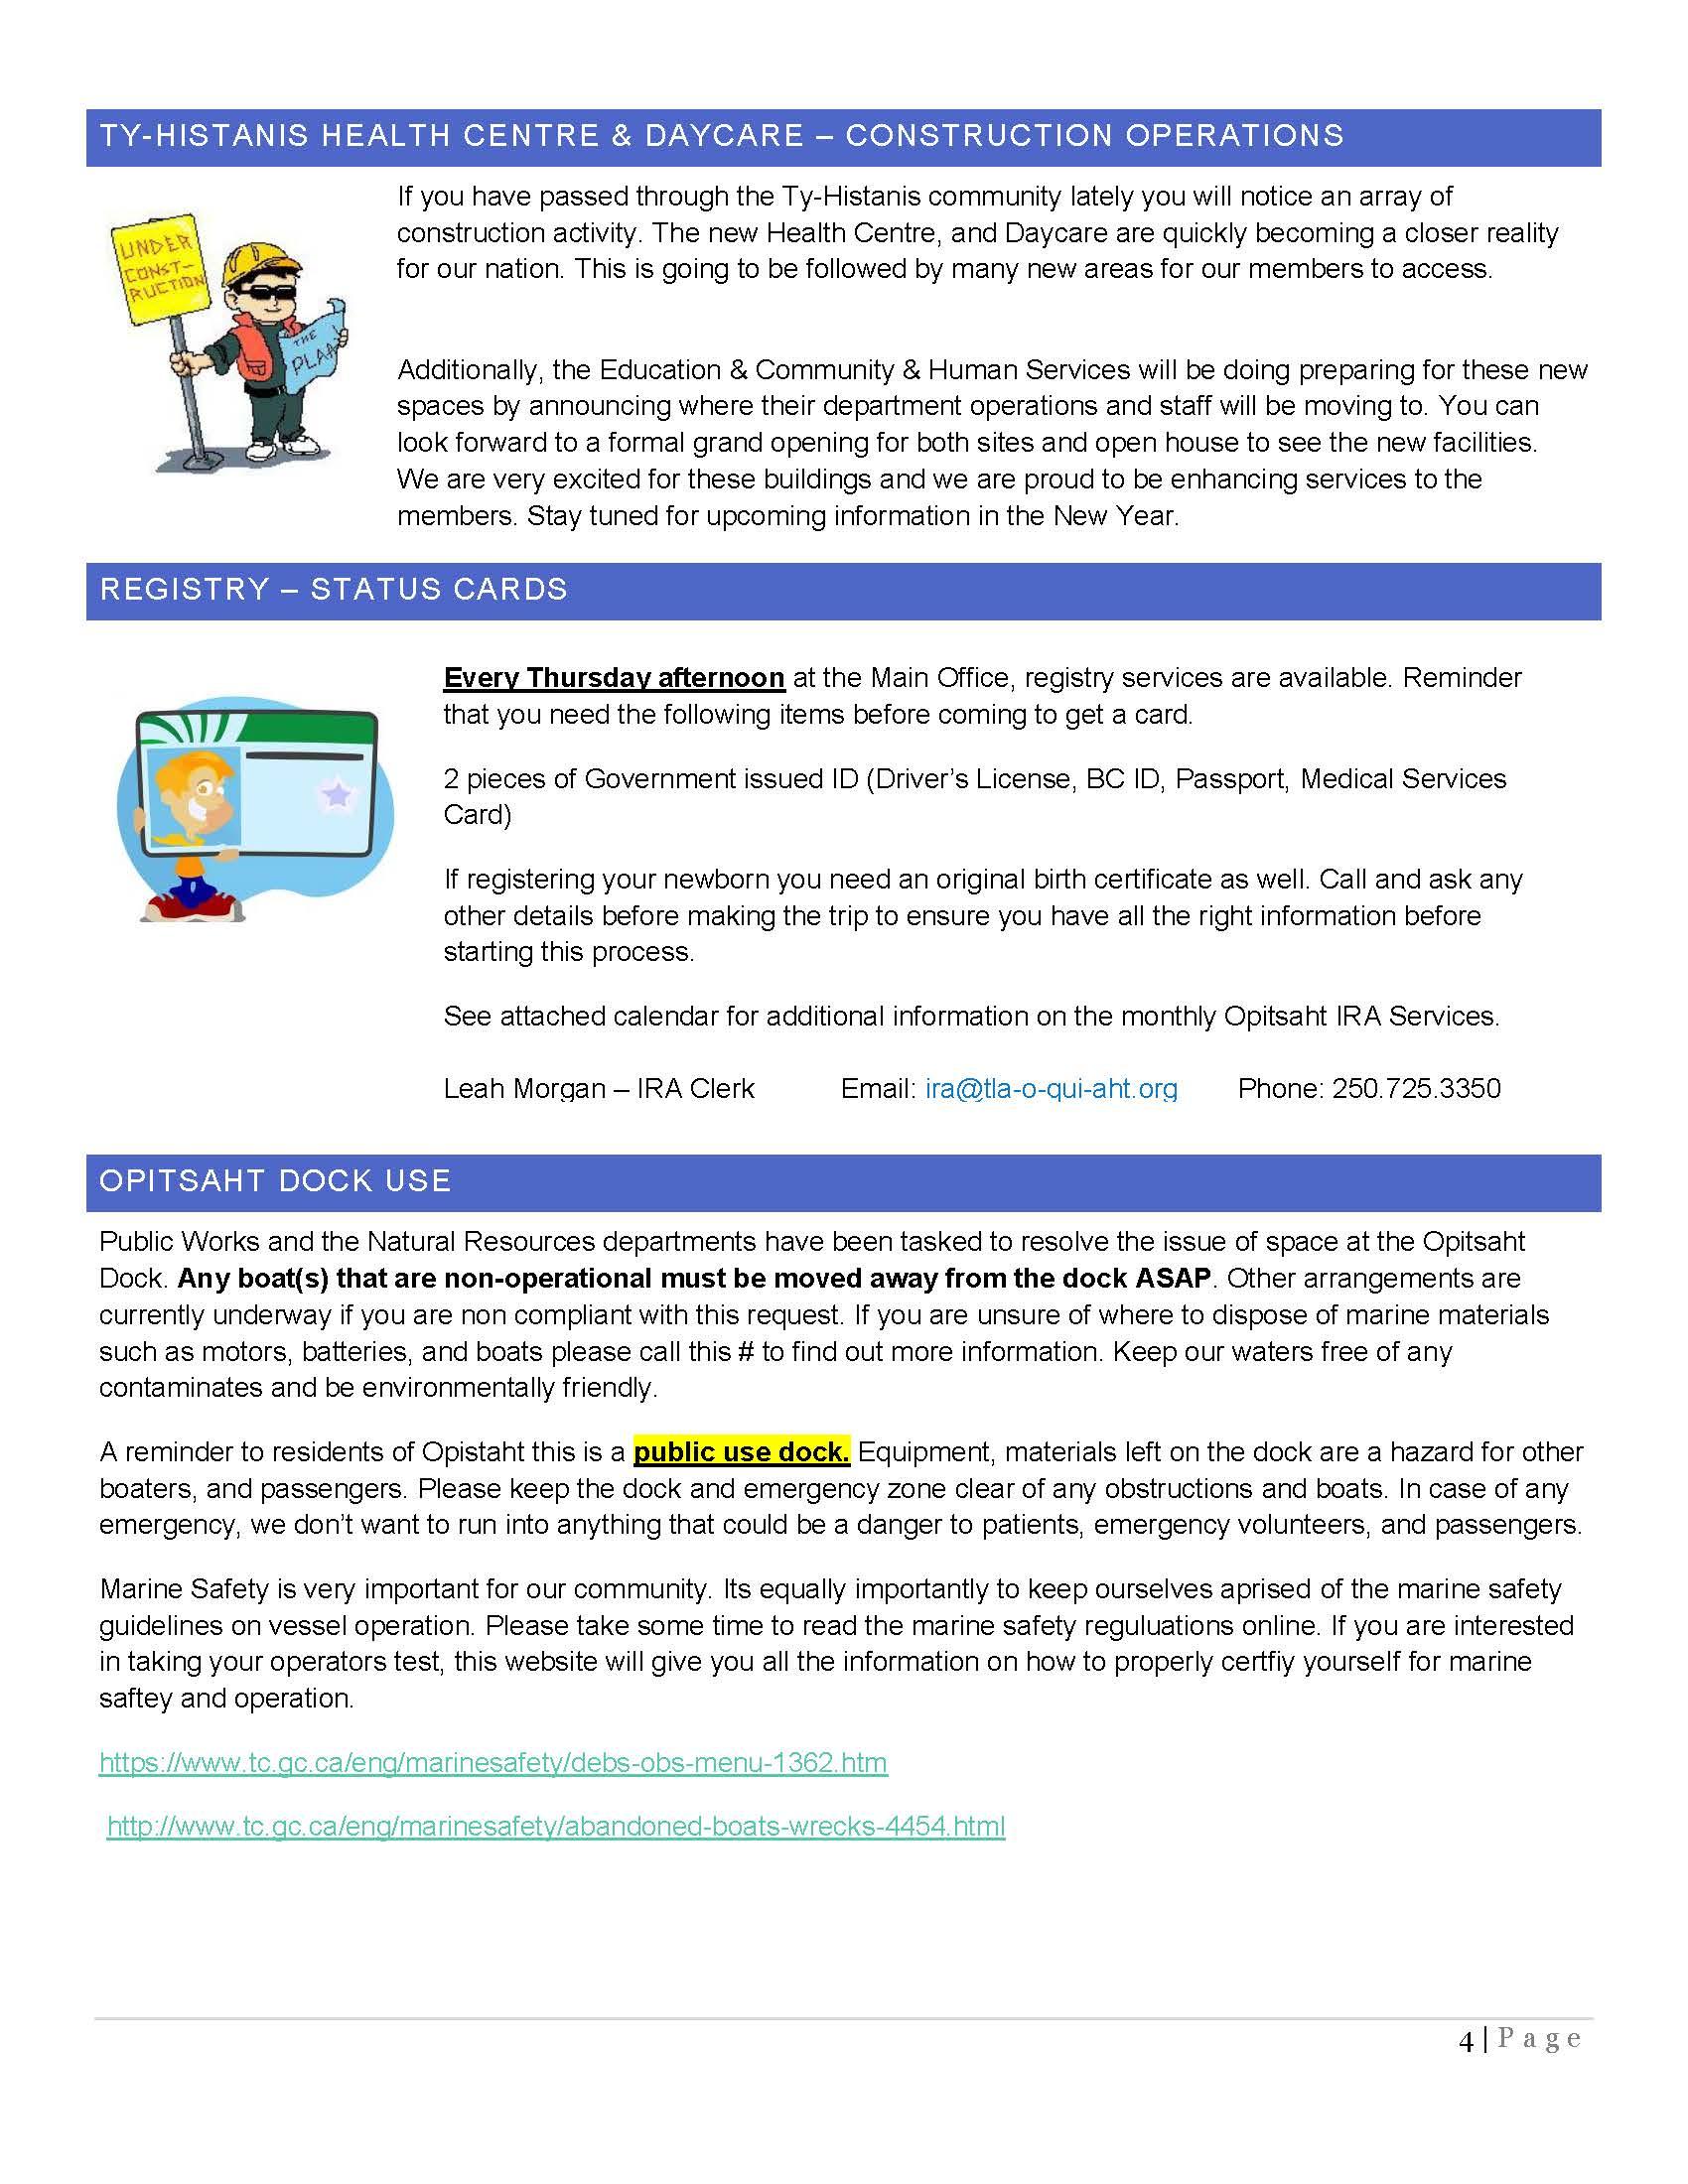 TFN Bulletin Dec 15-2016 - WEBSITE VERSION_Page_04.jpg